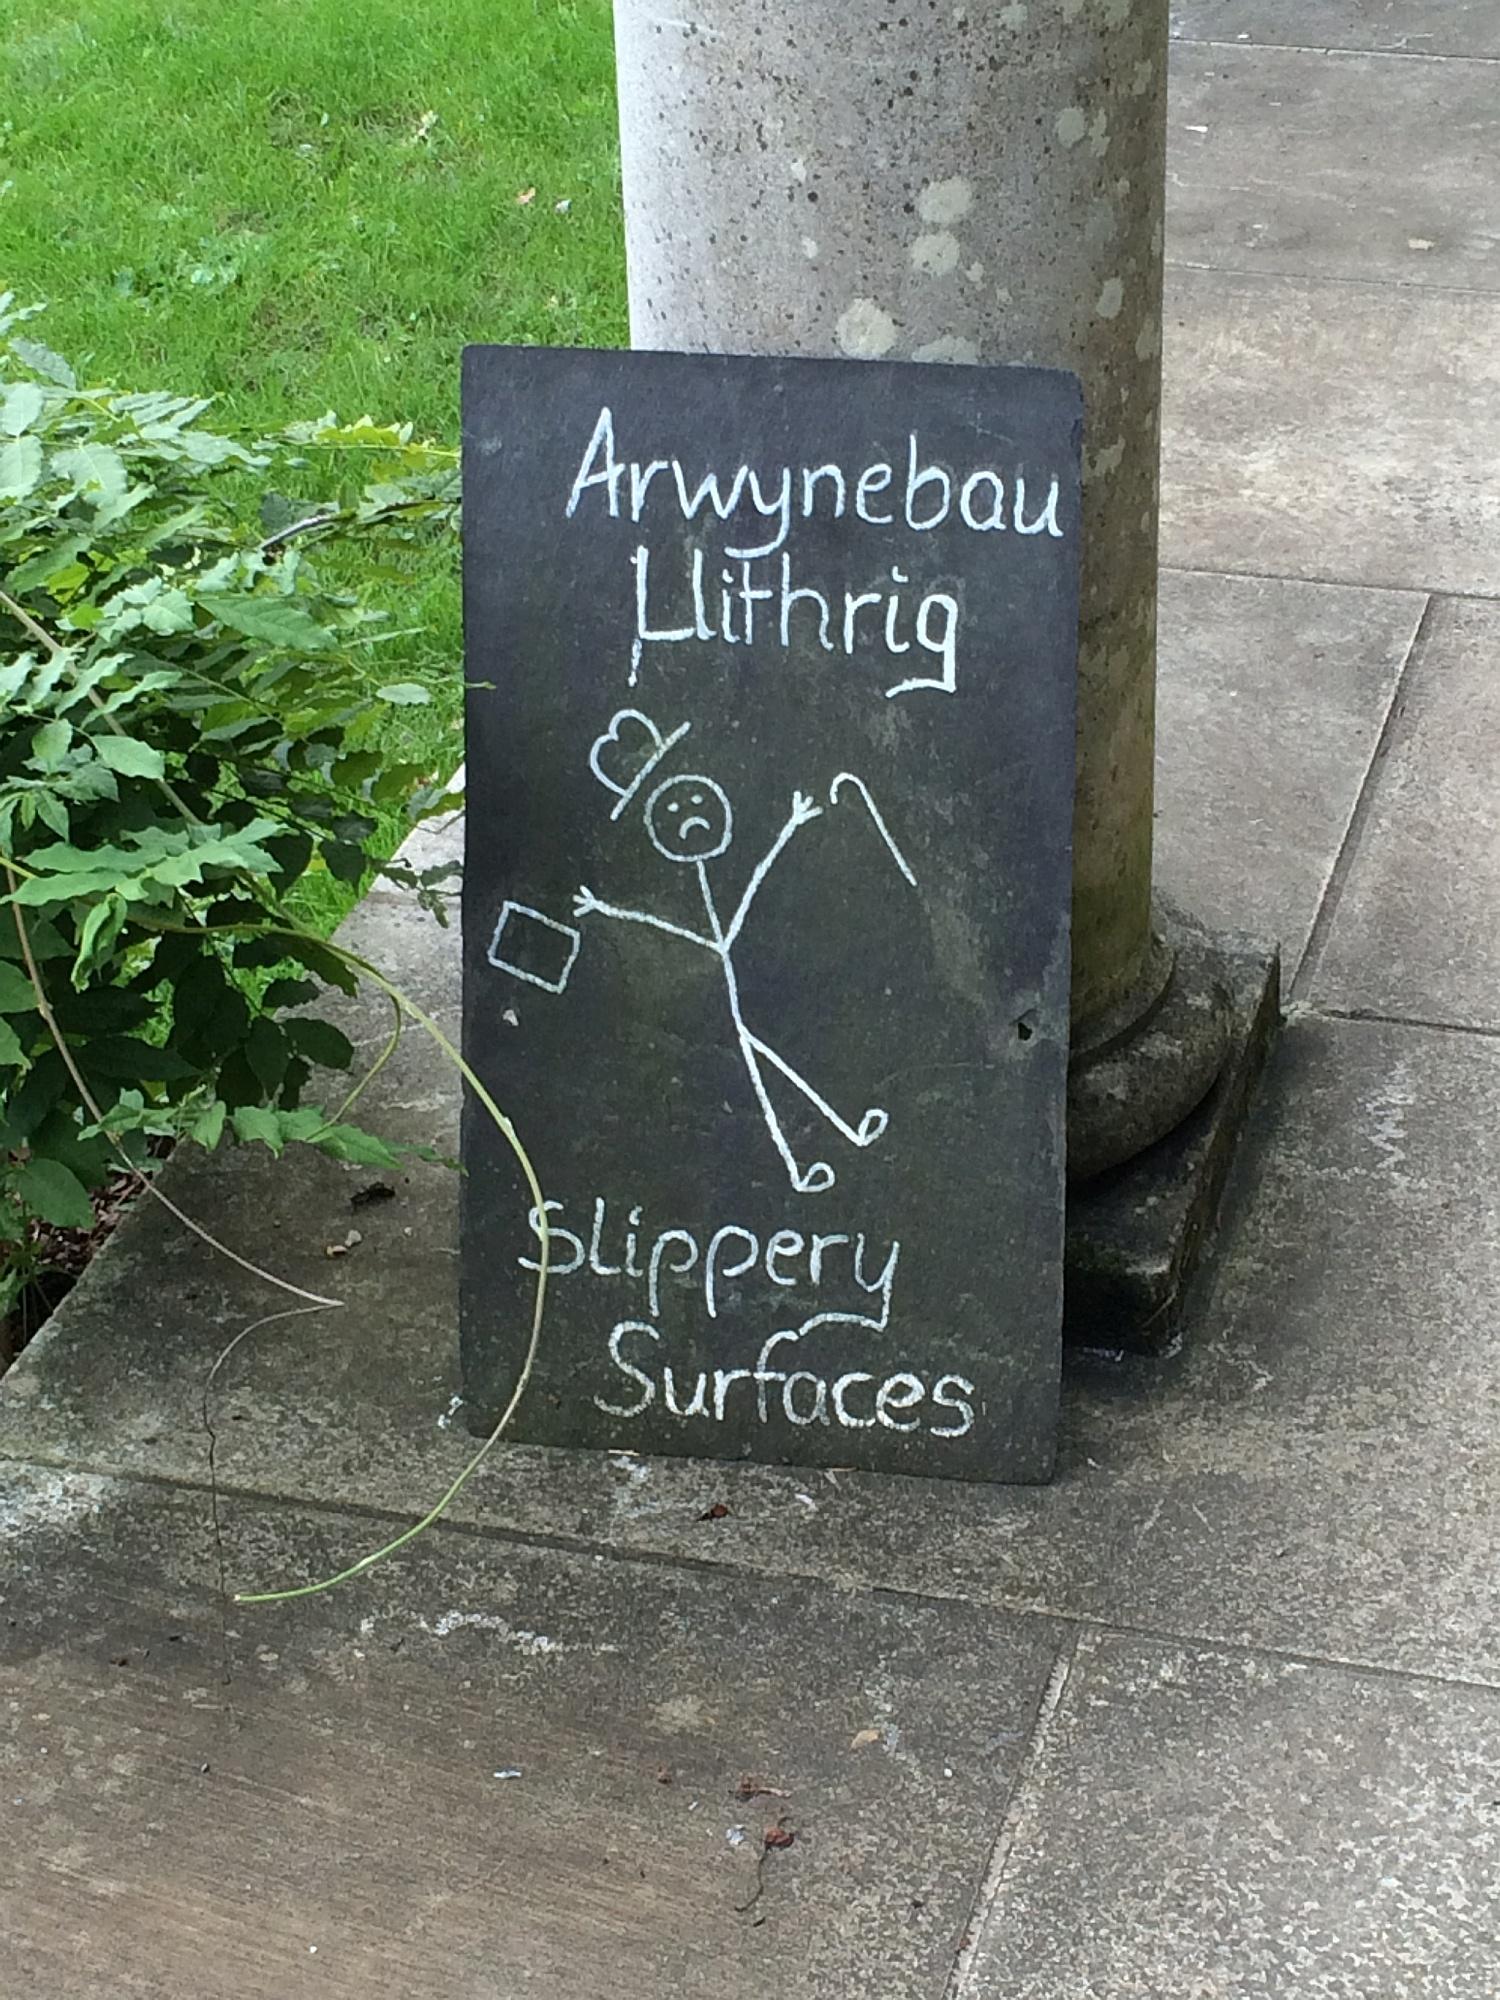 Funny sign - garden hazards